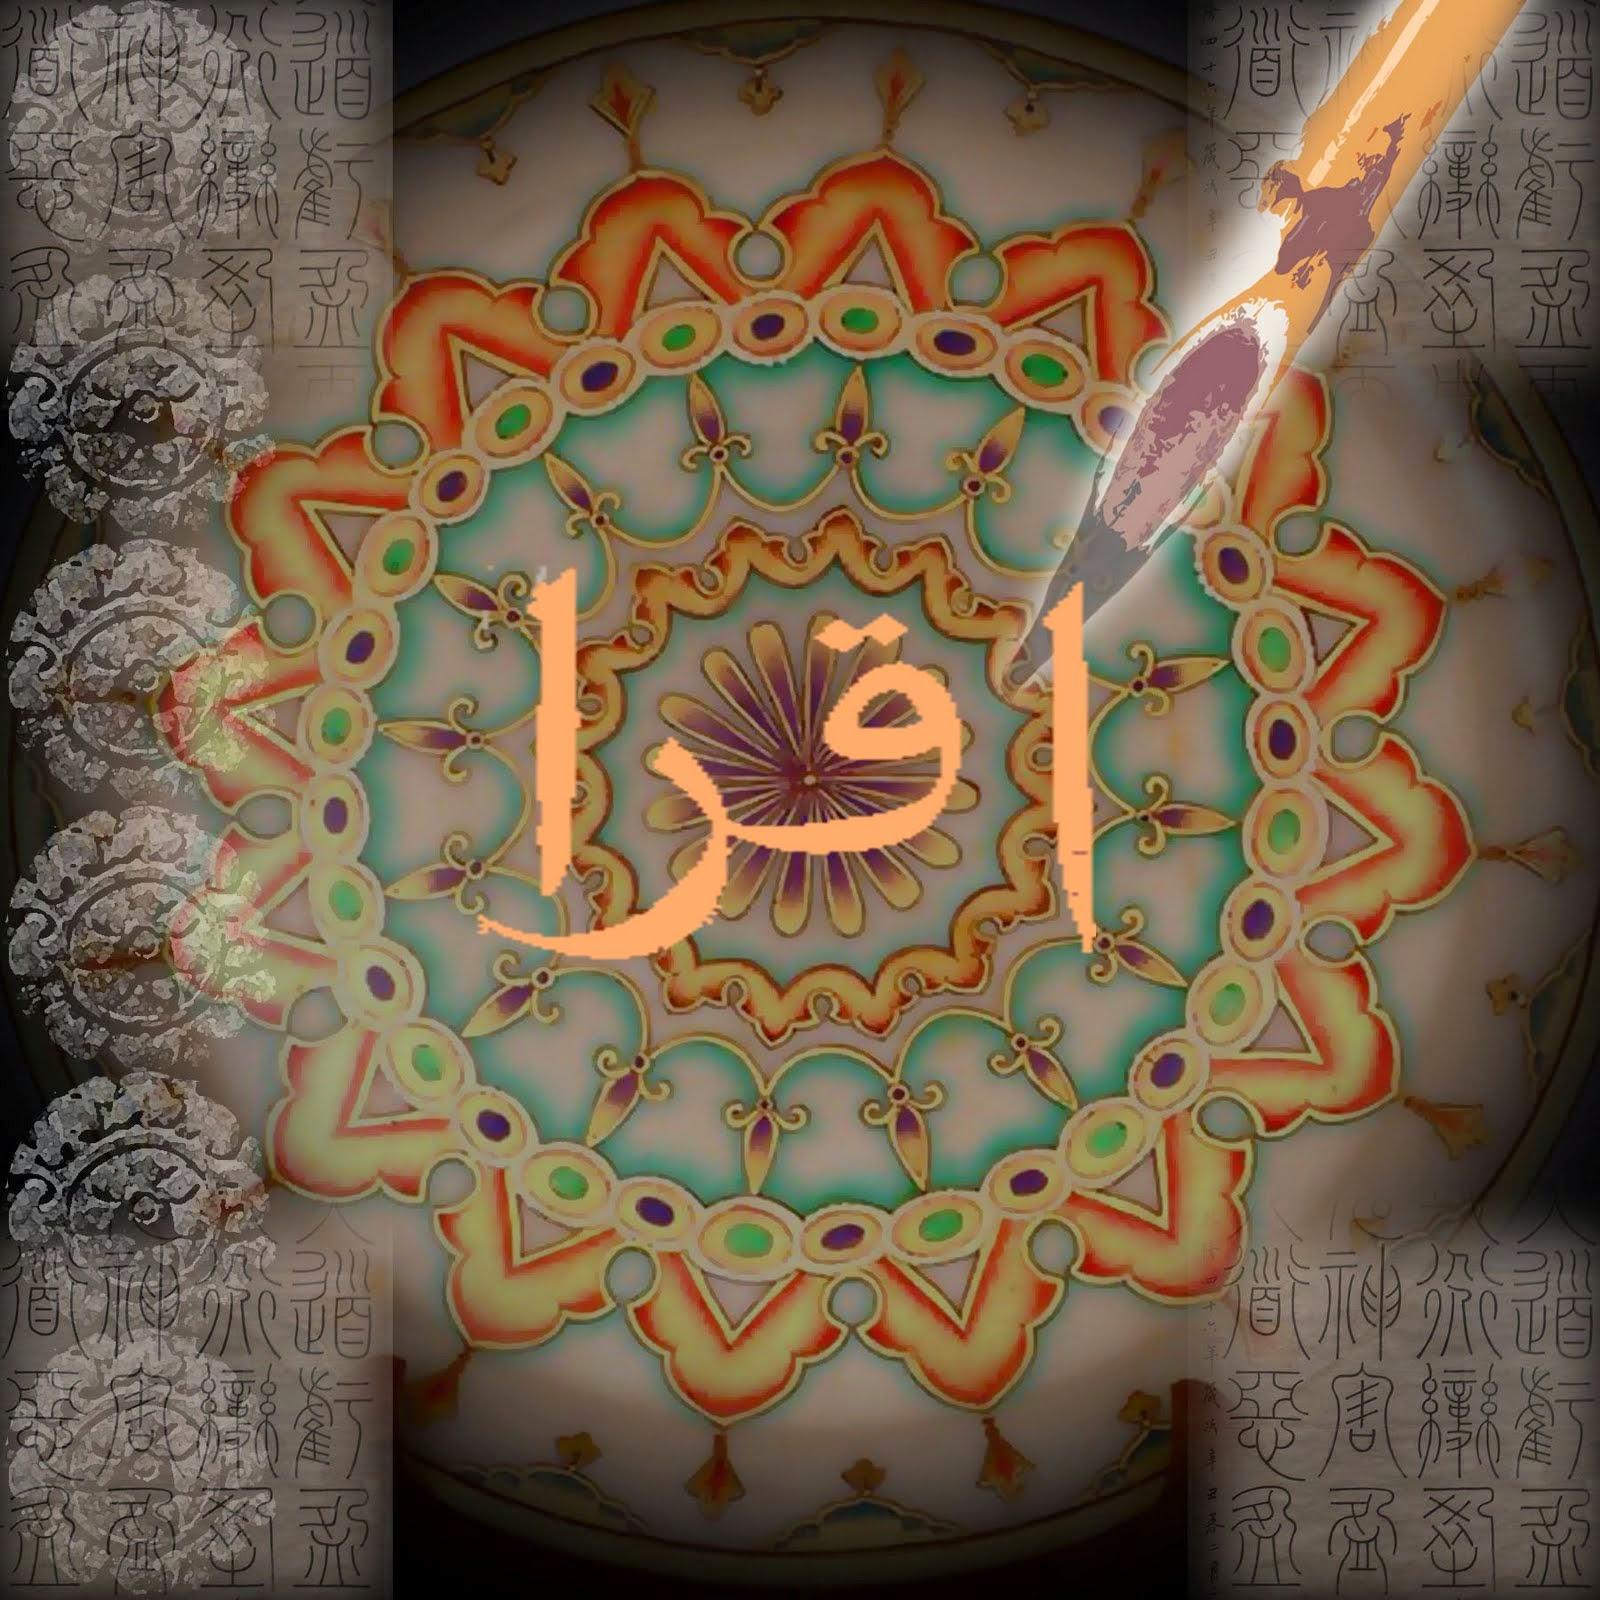 http://muslimclassics.blogspot.it/